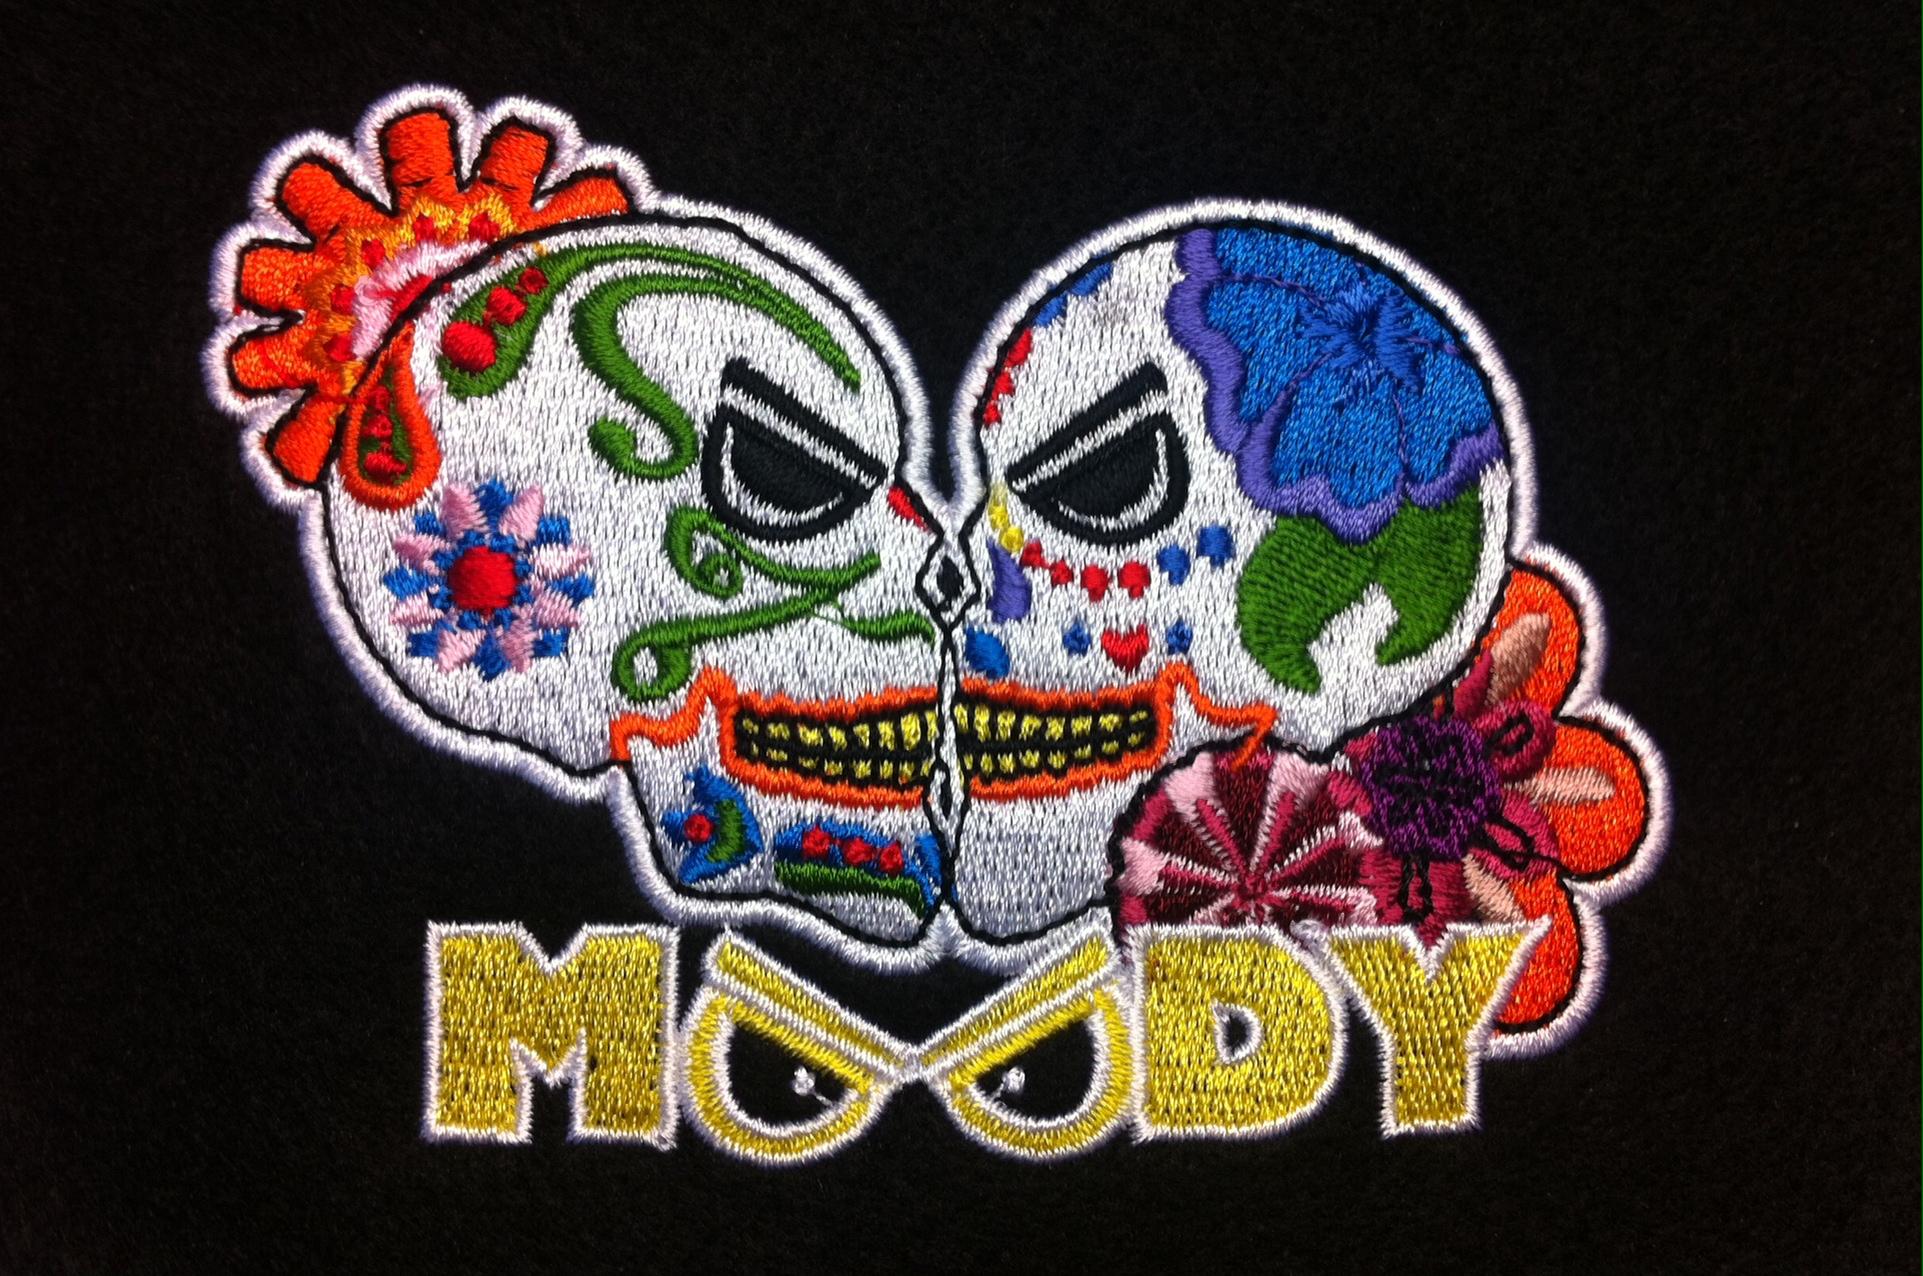 Moodyskulls cap embroidery